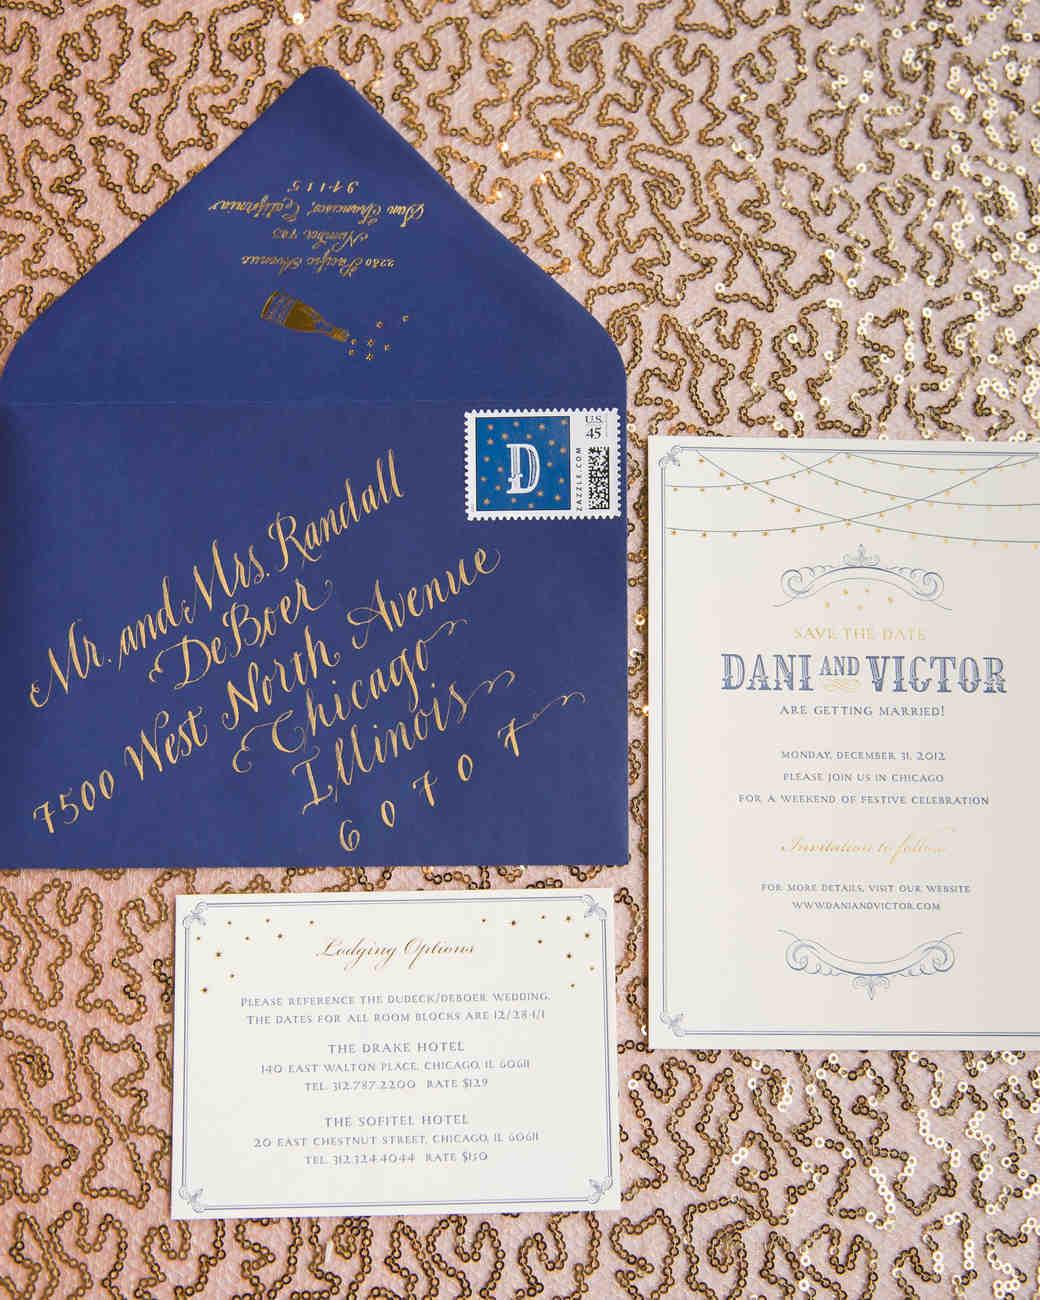 dani-victor-rw0513-1304.jpg